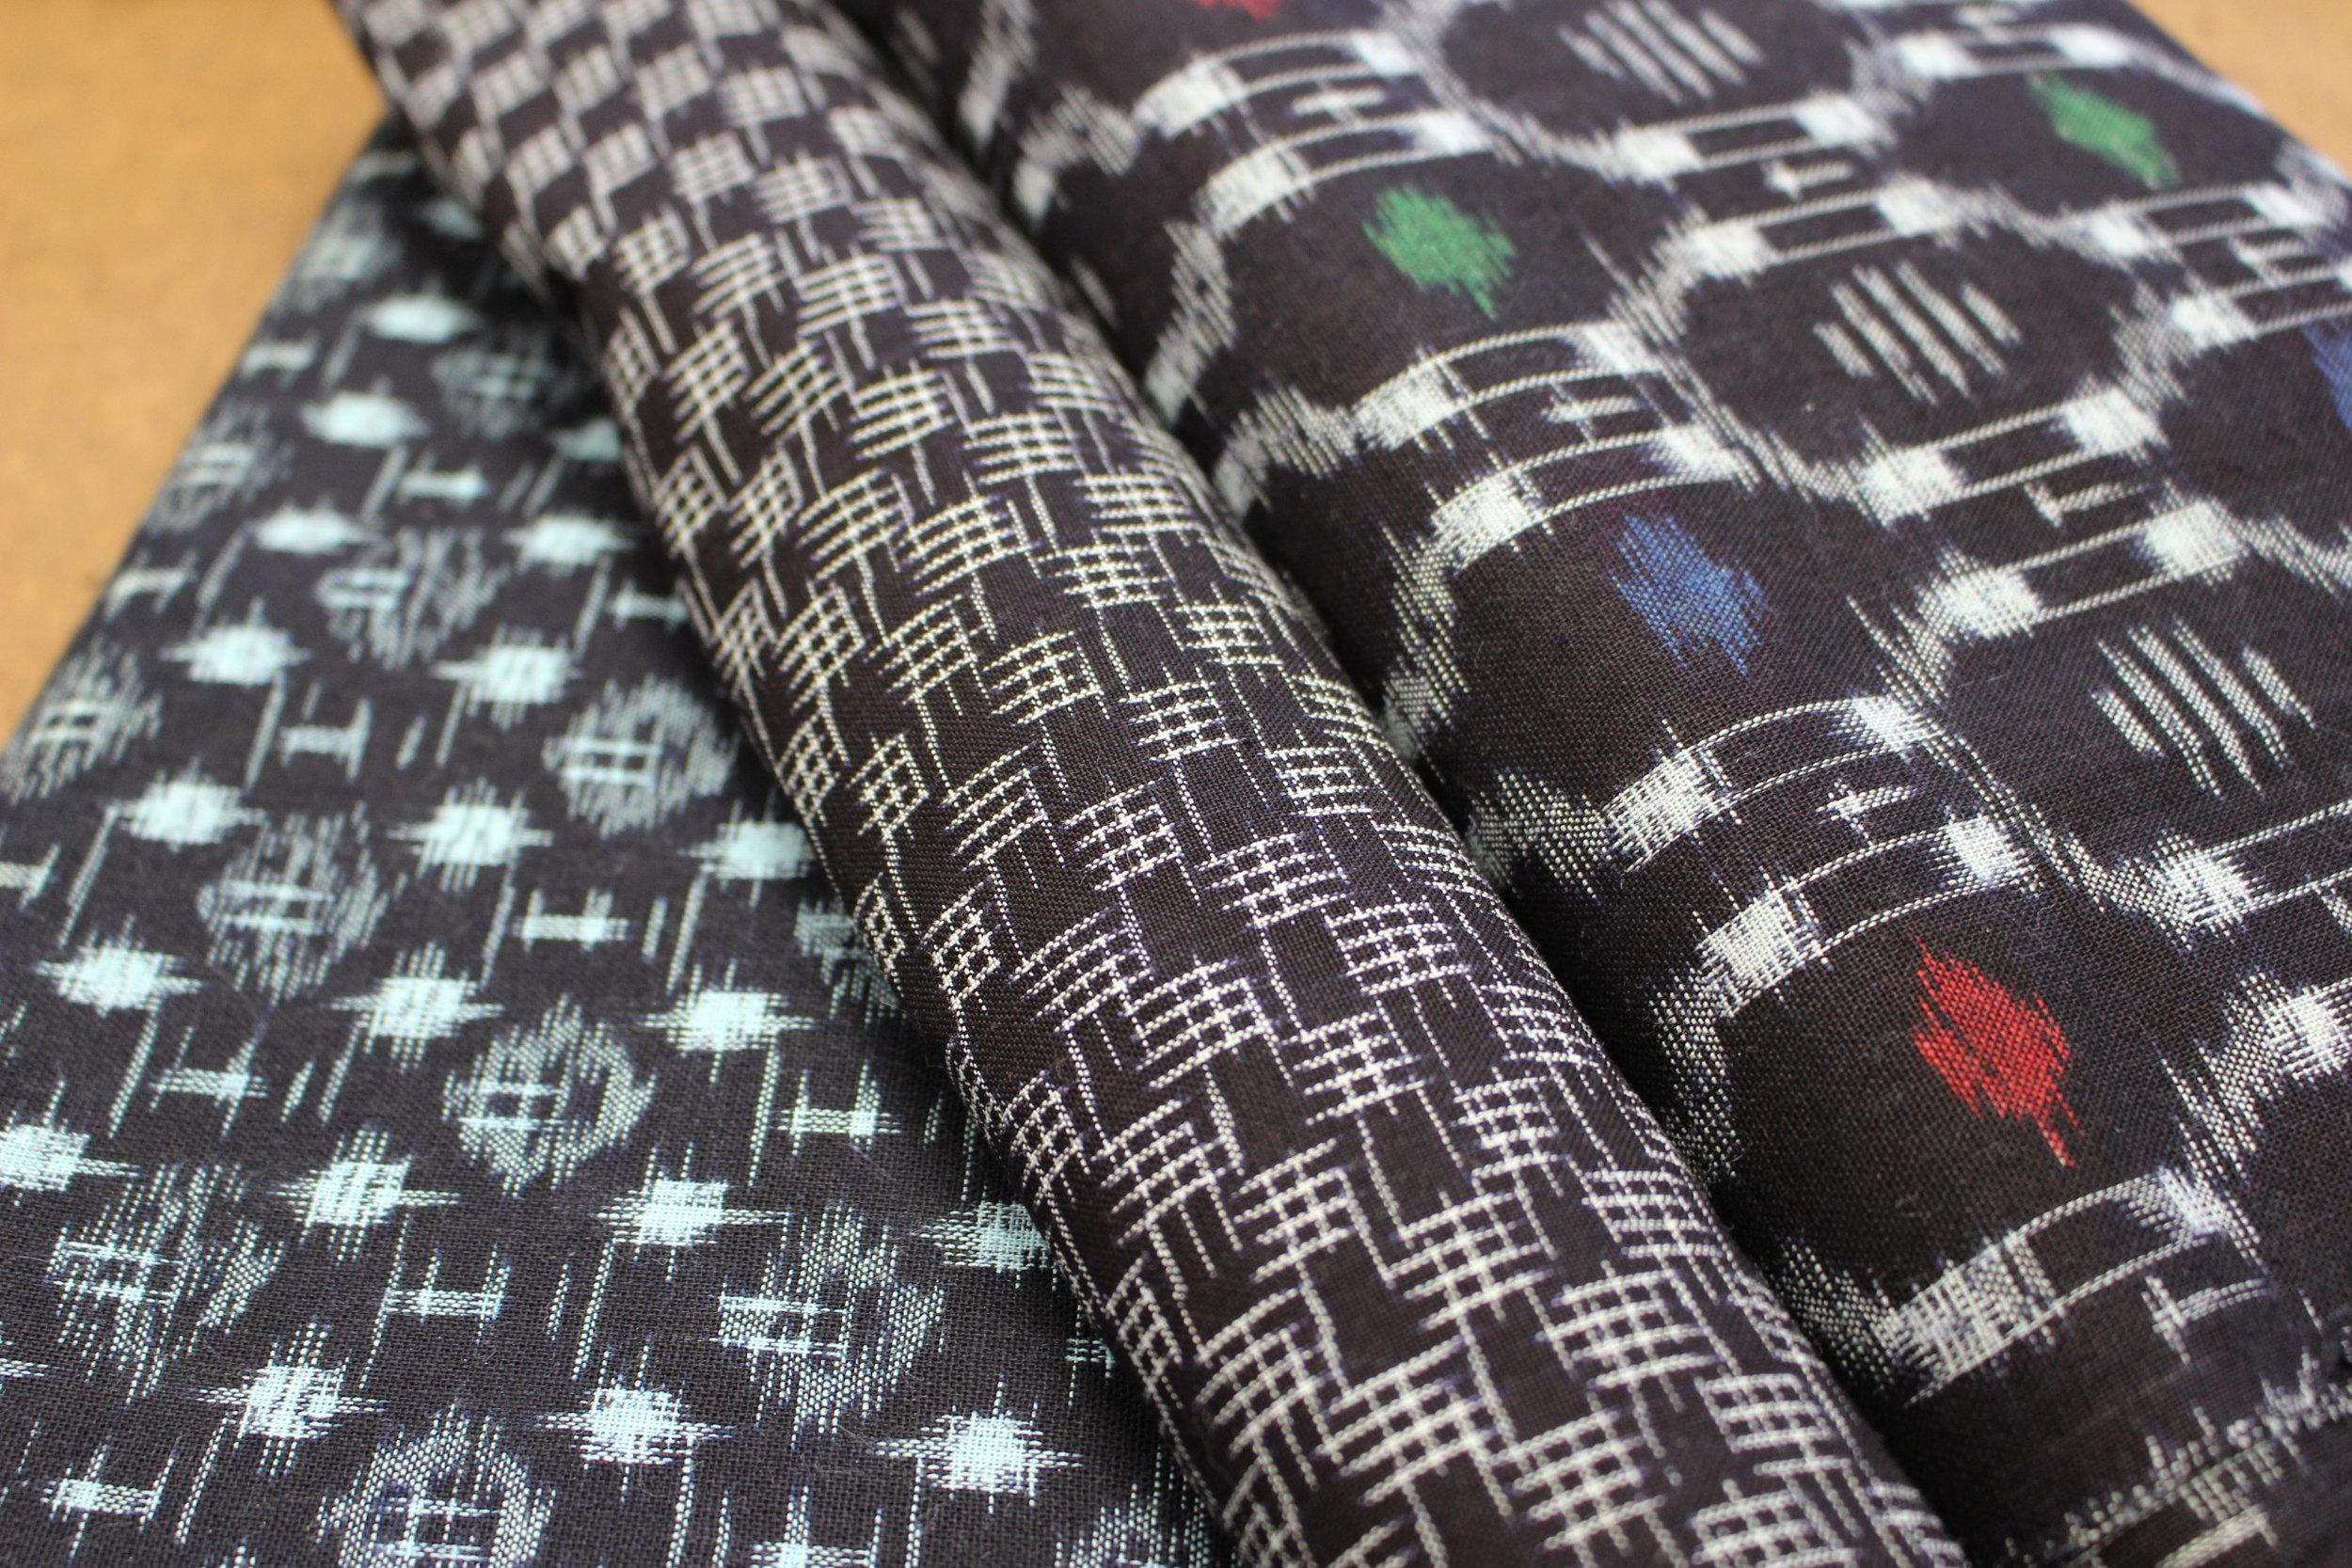 Kasuri - Vintage Kasuri Textiles from various areas in Japan